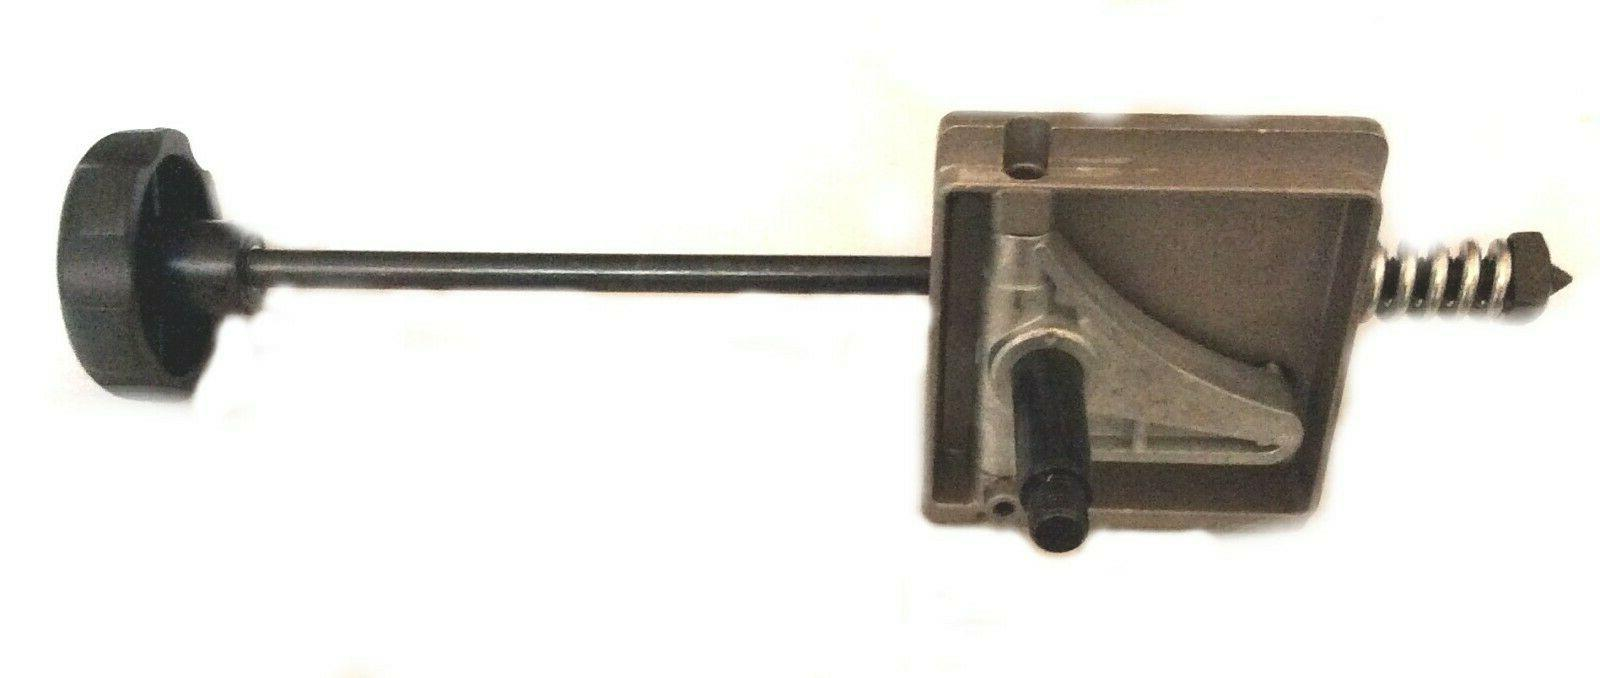 band saw upper shaft hinge assembly